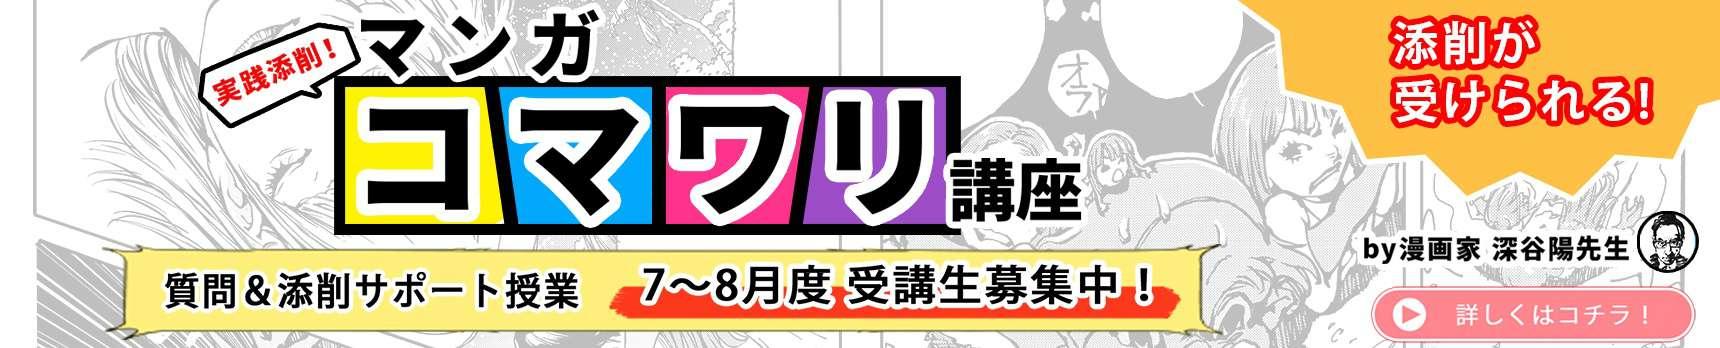 Fukaya support banner pc